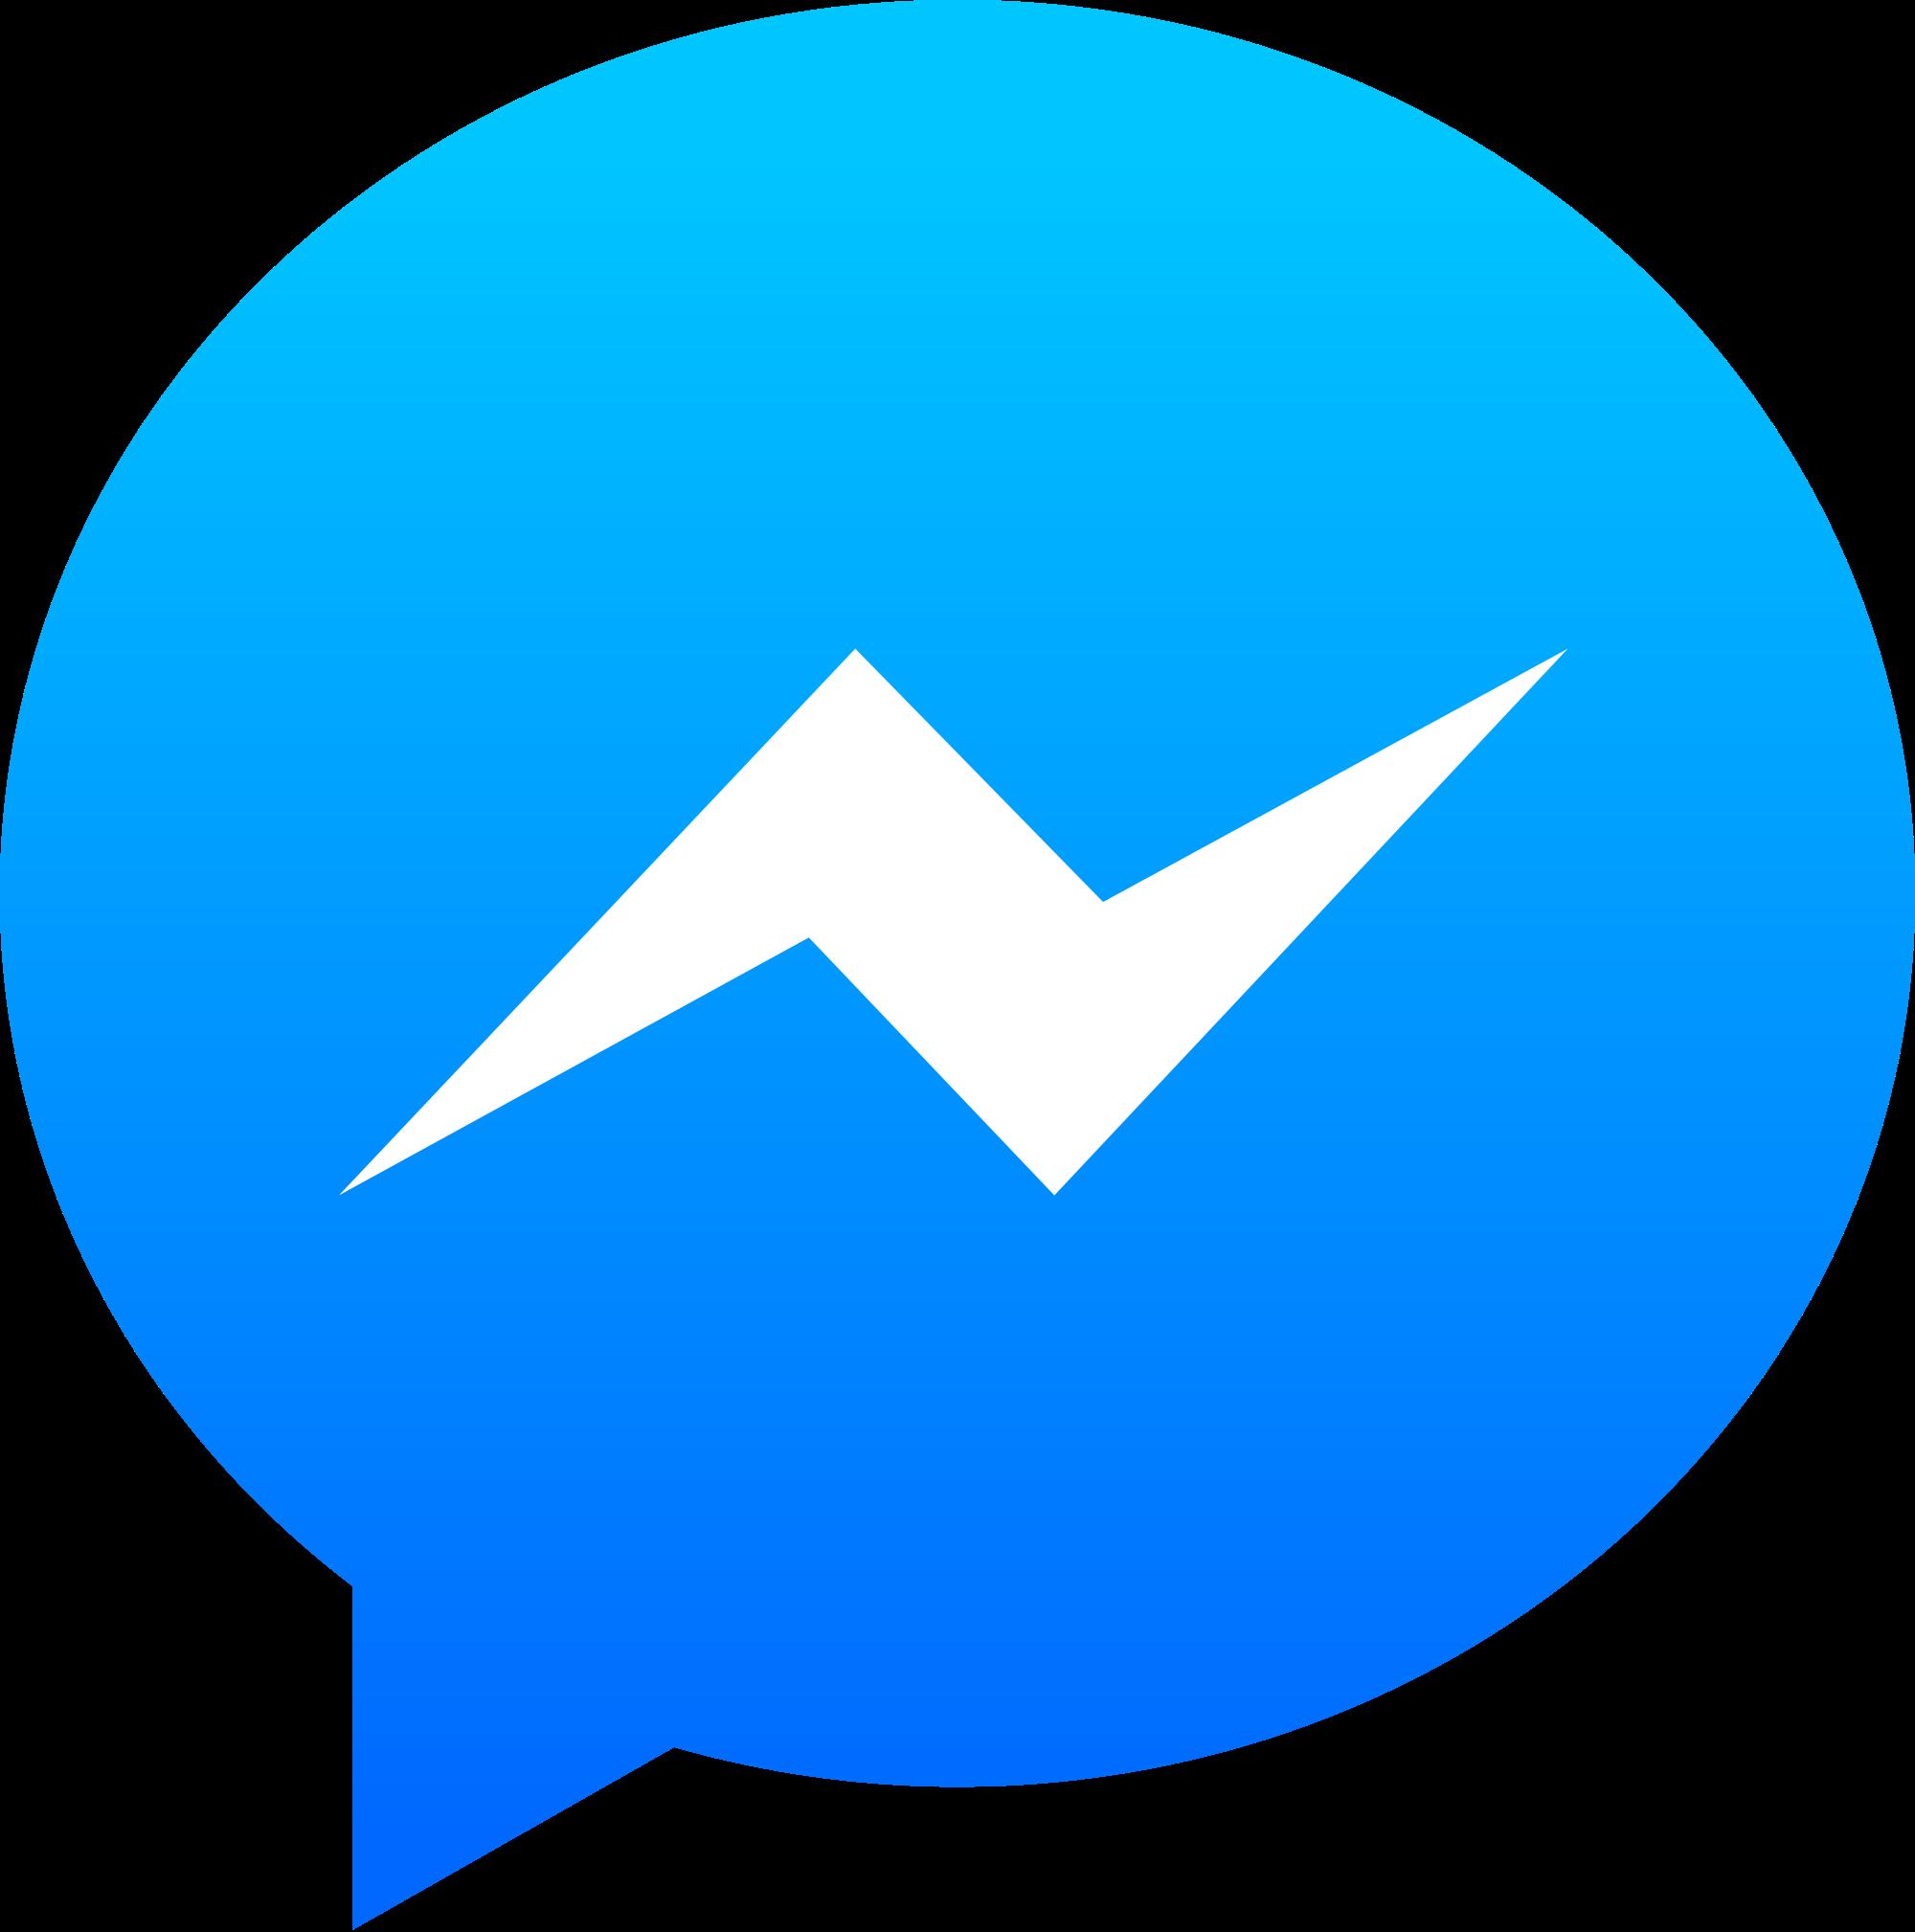 Open - Facebook Messenger Logo (2000x2018), Png Download